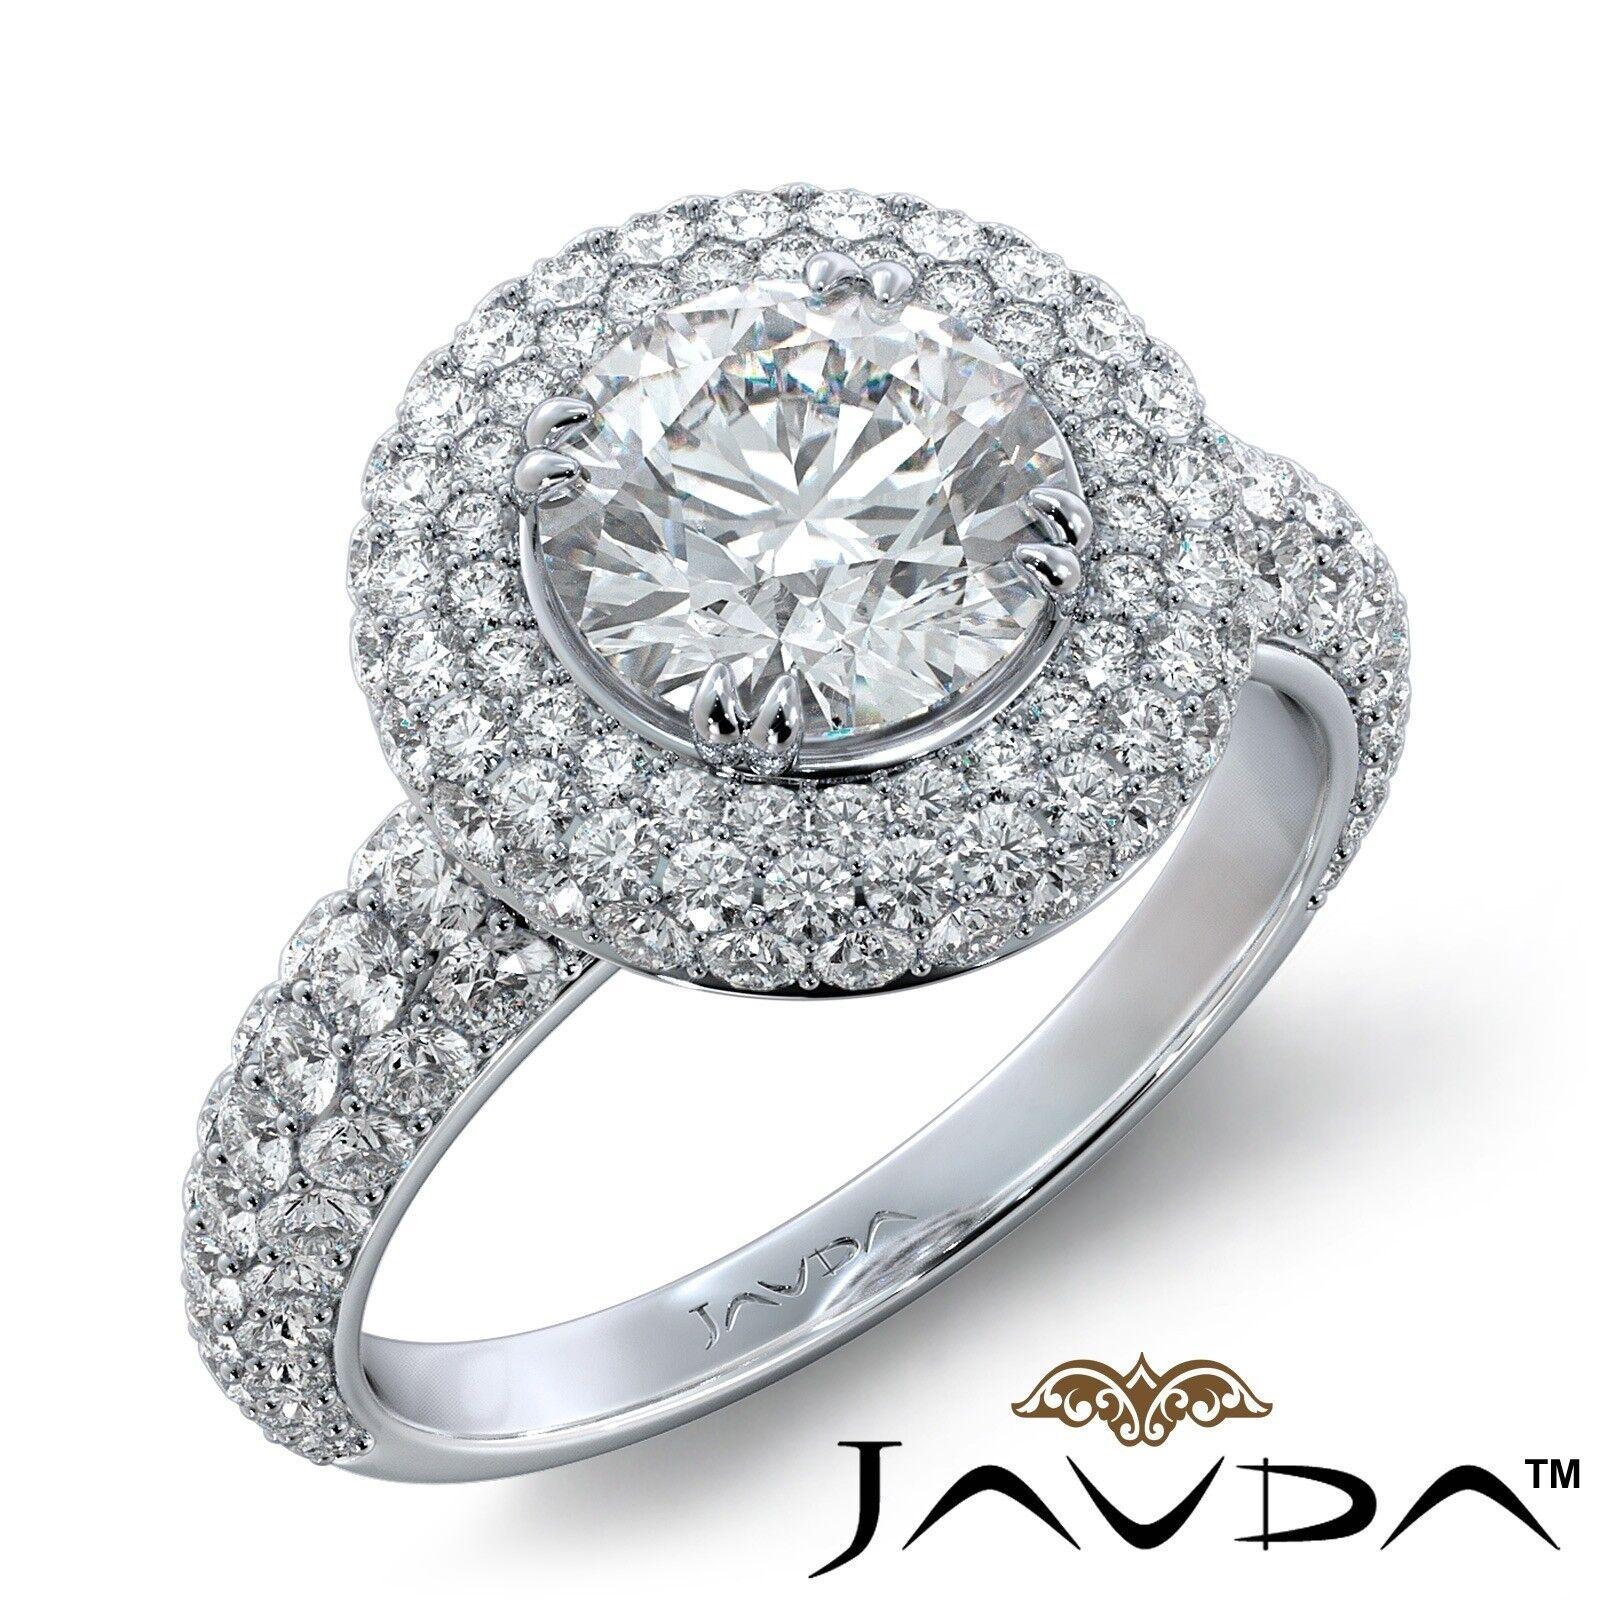 2.74ctw Trio Halo Double Prong Round Diamond Engagement Ring GIA F-VVS1 W Gold